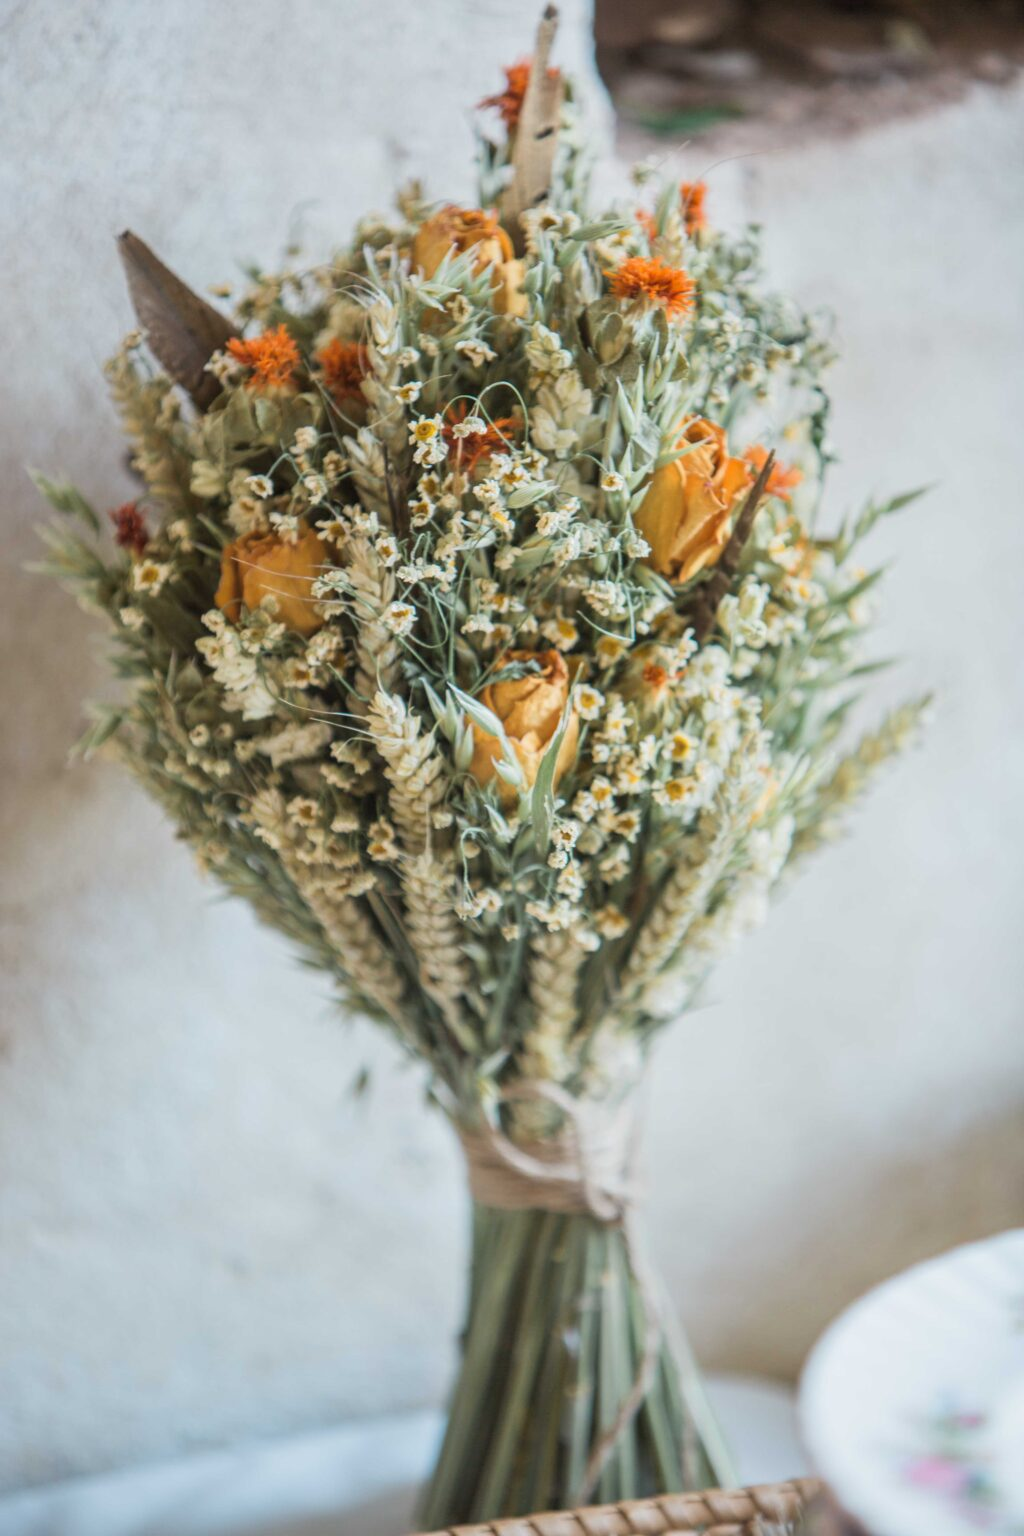 Tørret brudebuket med korn og orange blomster